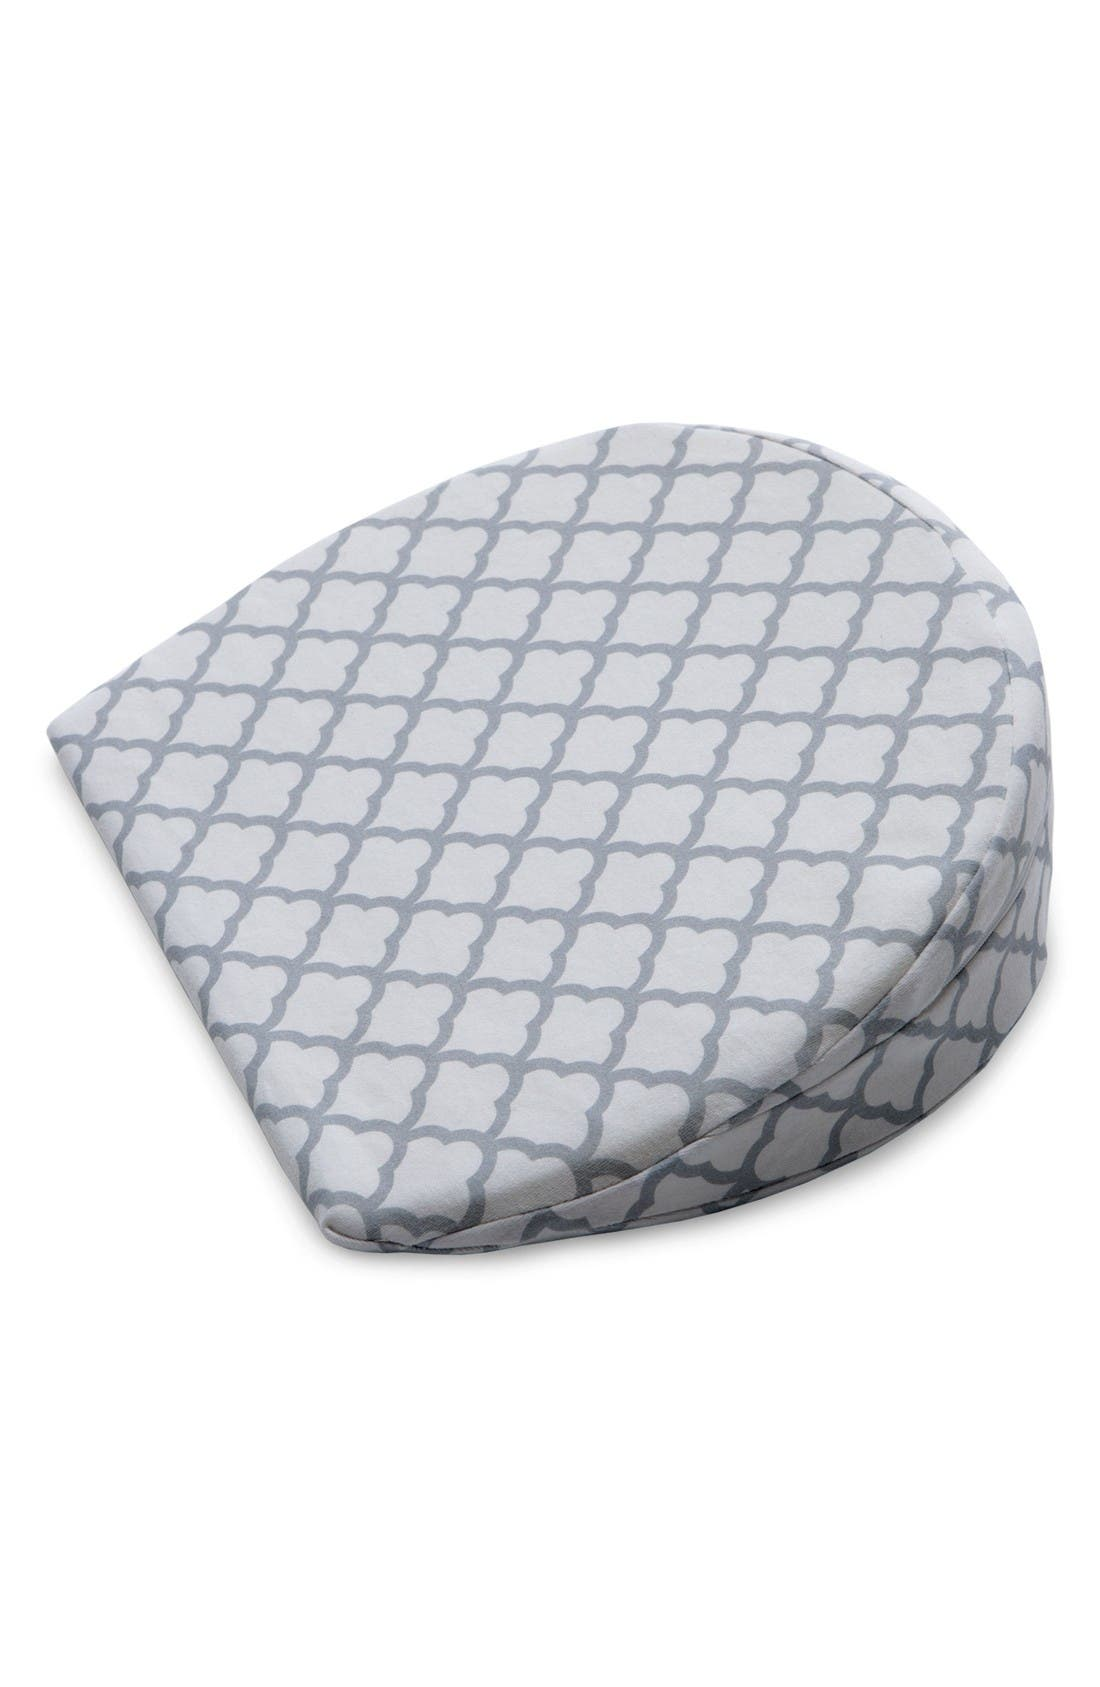 Boppy Pregnancy Wedge Cushion & Slipcover